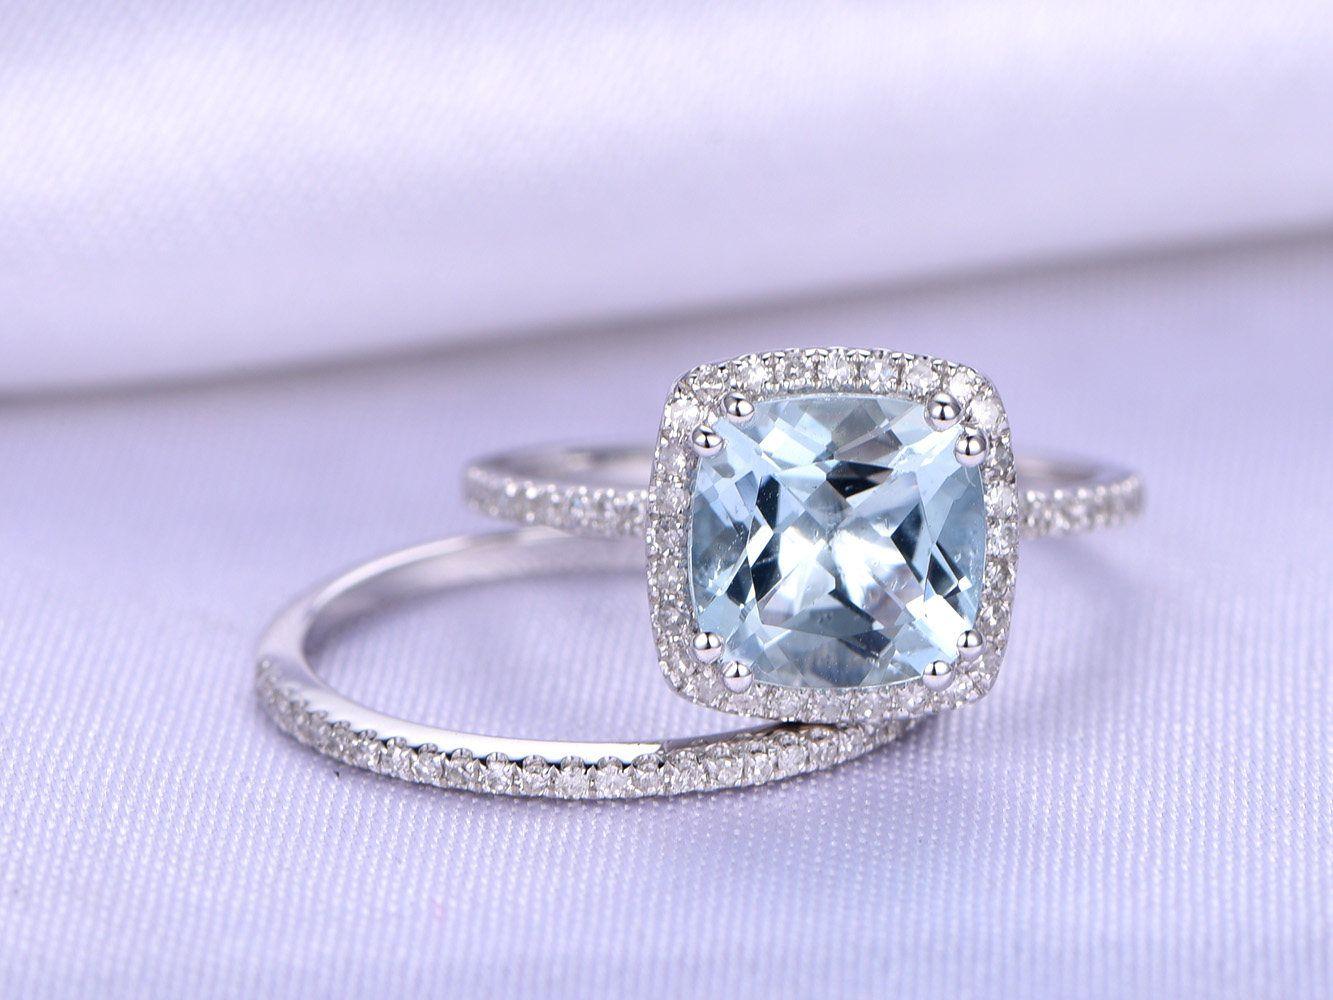 Aquamarine Ring Wedding Ring Set 8mm Cushion Cut Aquamarine